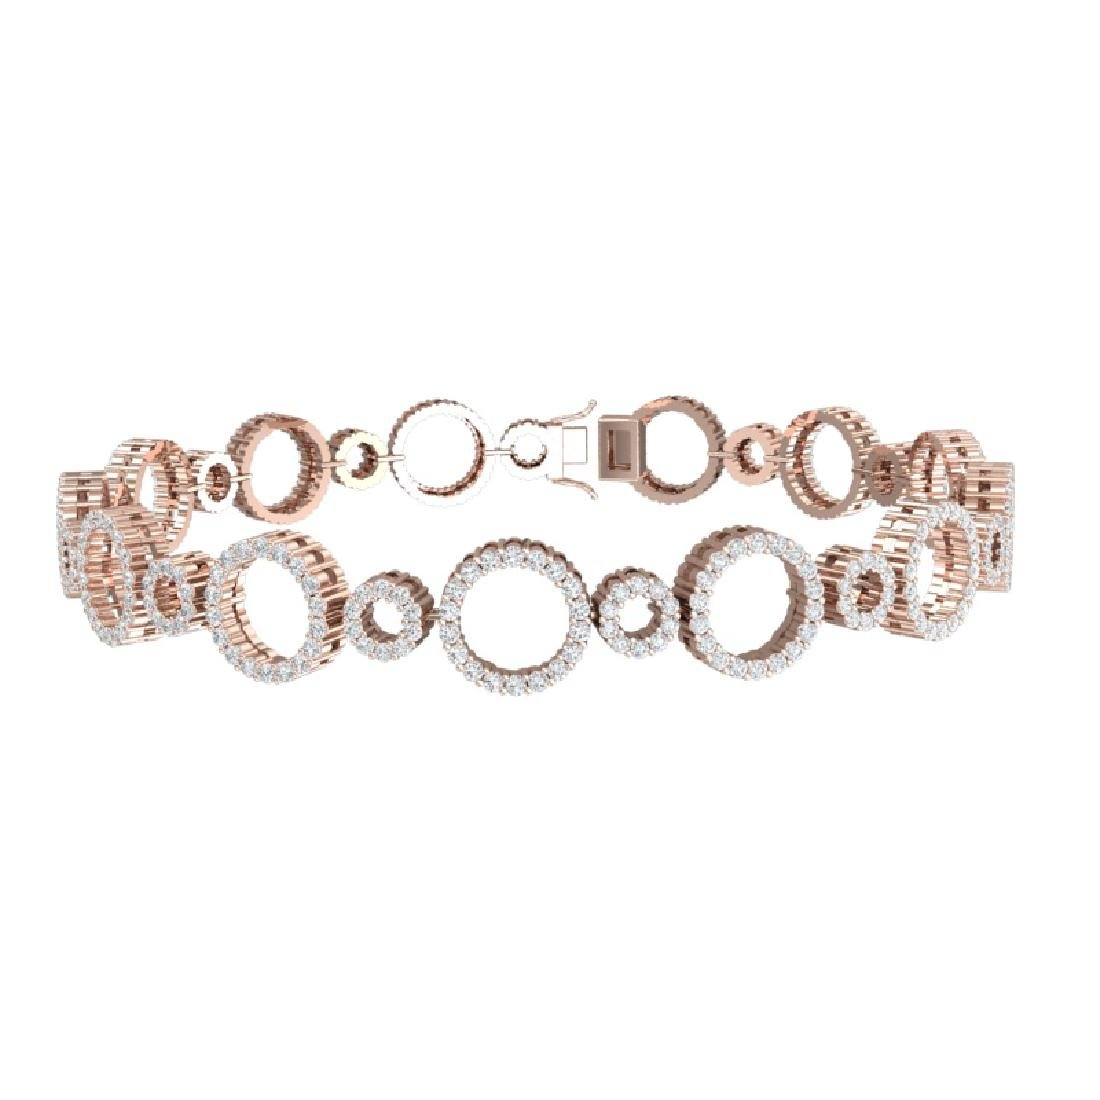 4 CTW Certified SI/I Diamond Halo Bracelet 18K Rose - 3